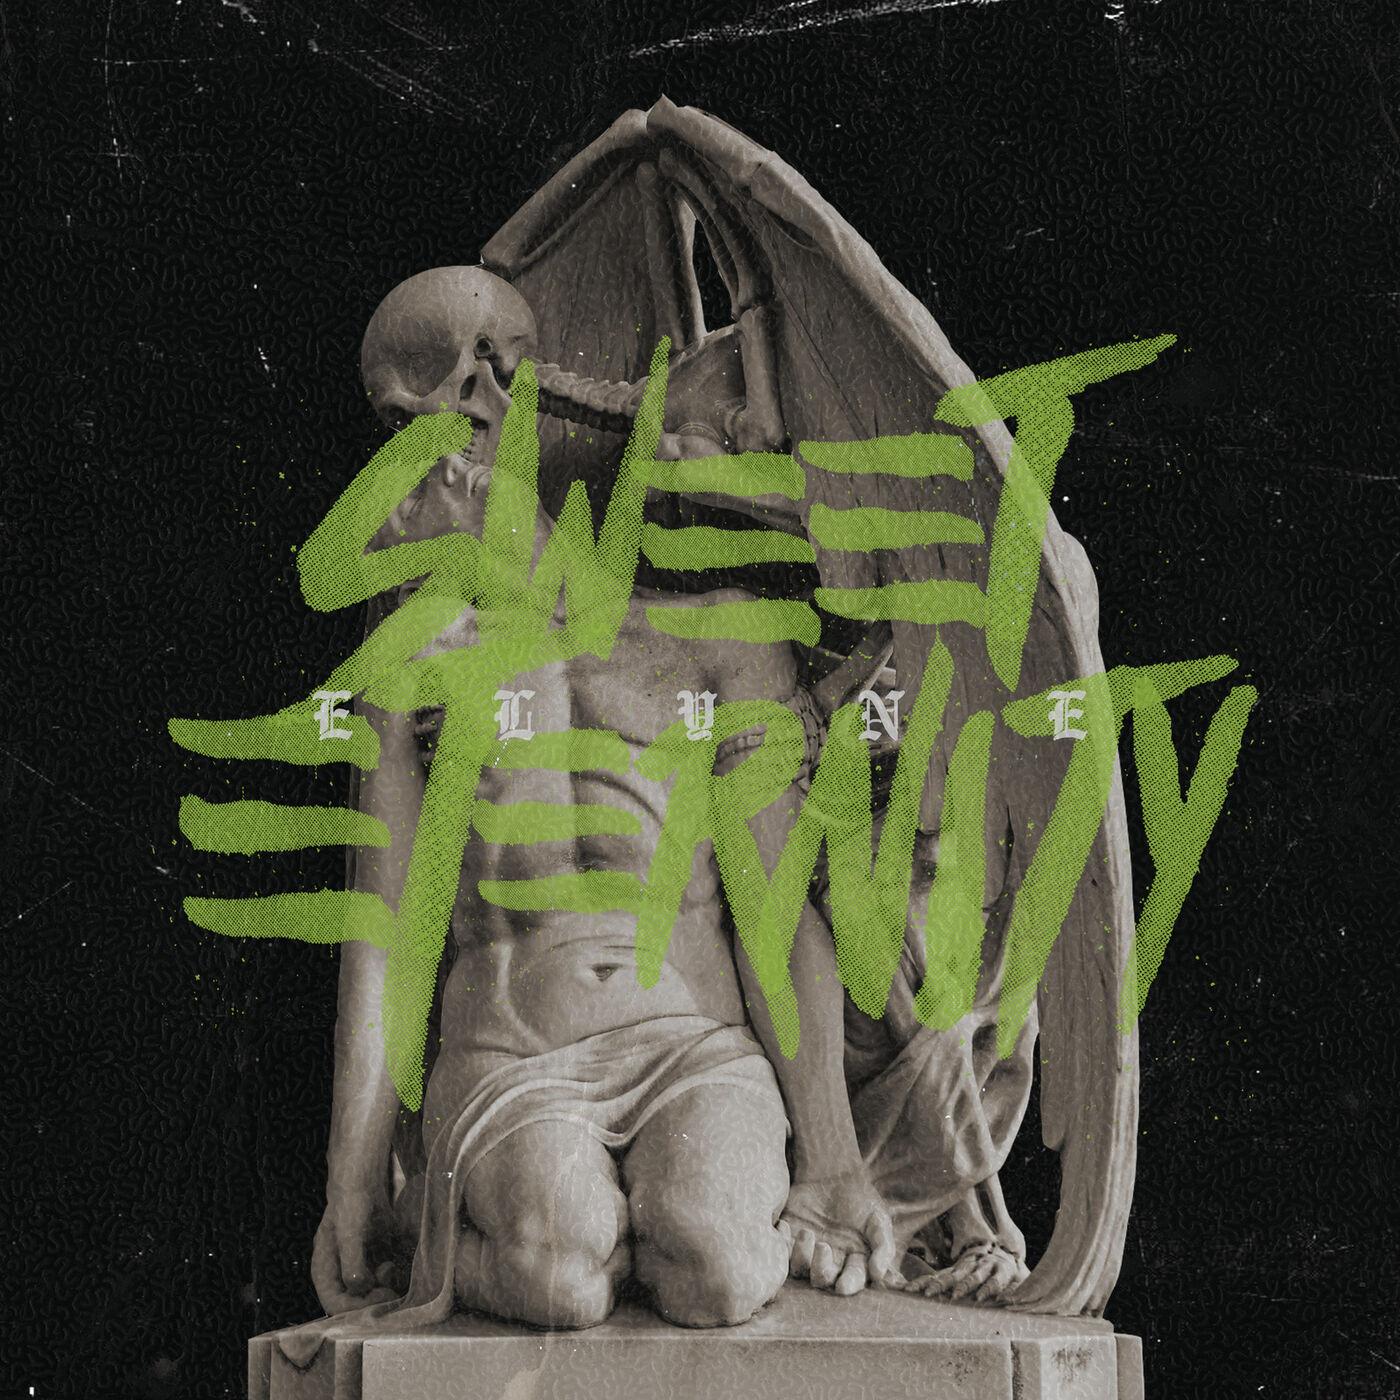 Elyne - Sweet Eternity [single] (2020)